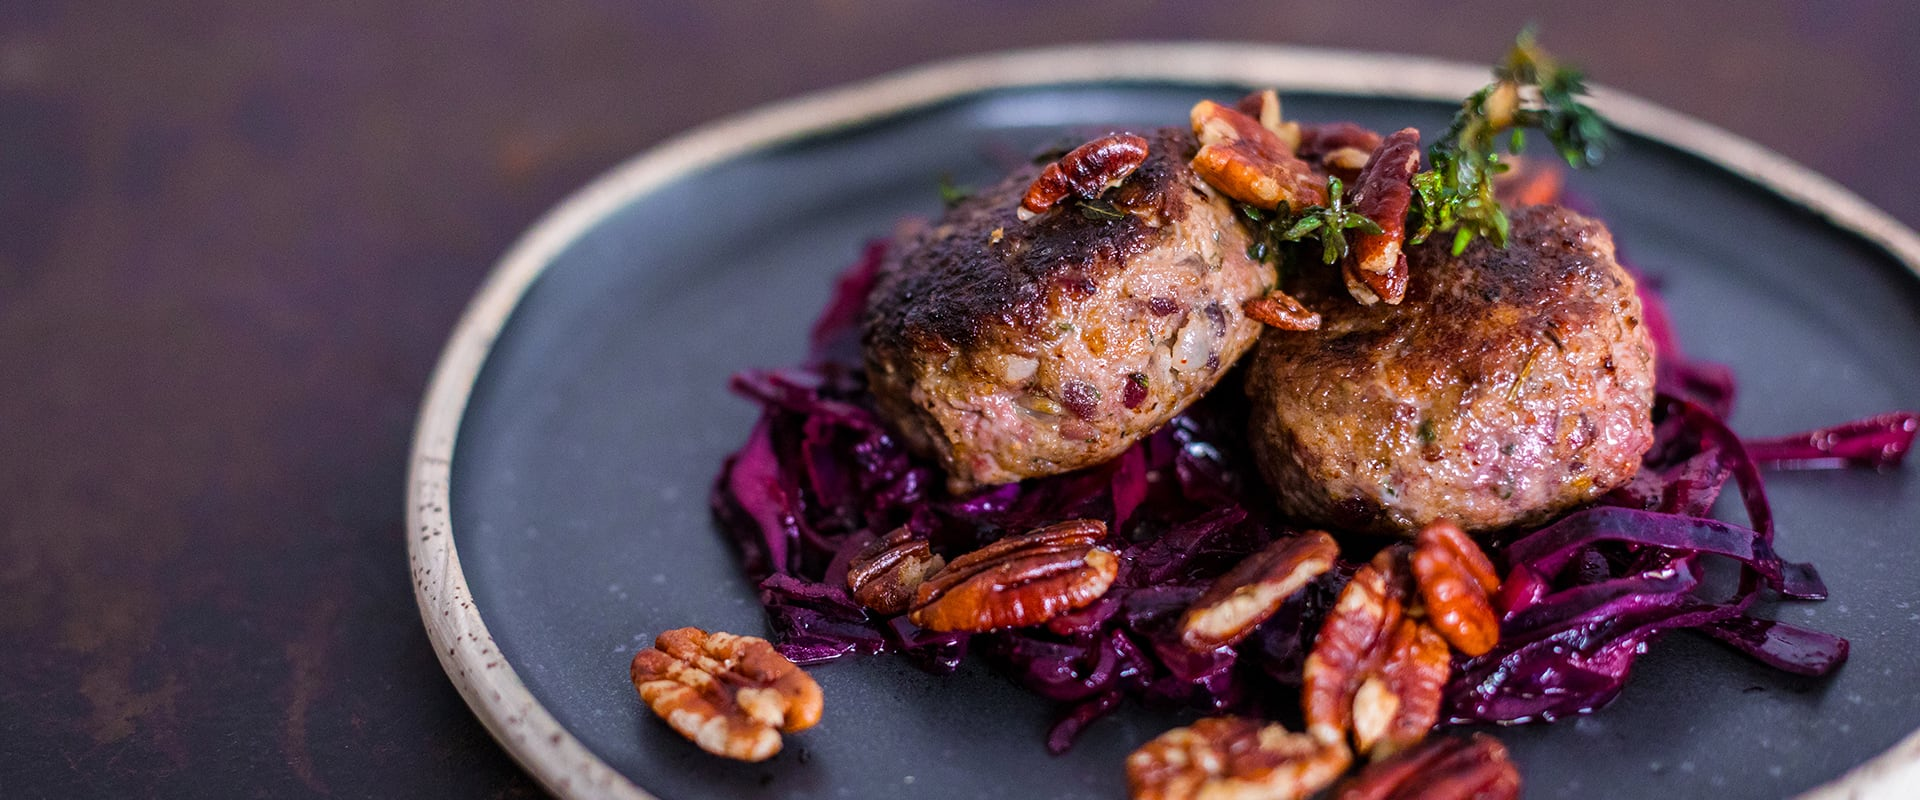 Enten-Pflanzerl mit lauwarmem Blaukraut-Salat